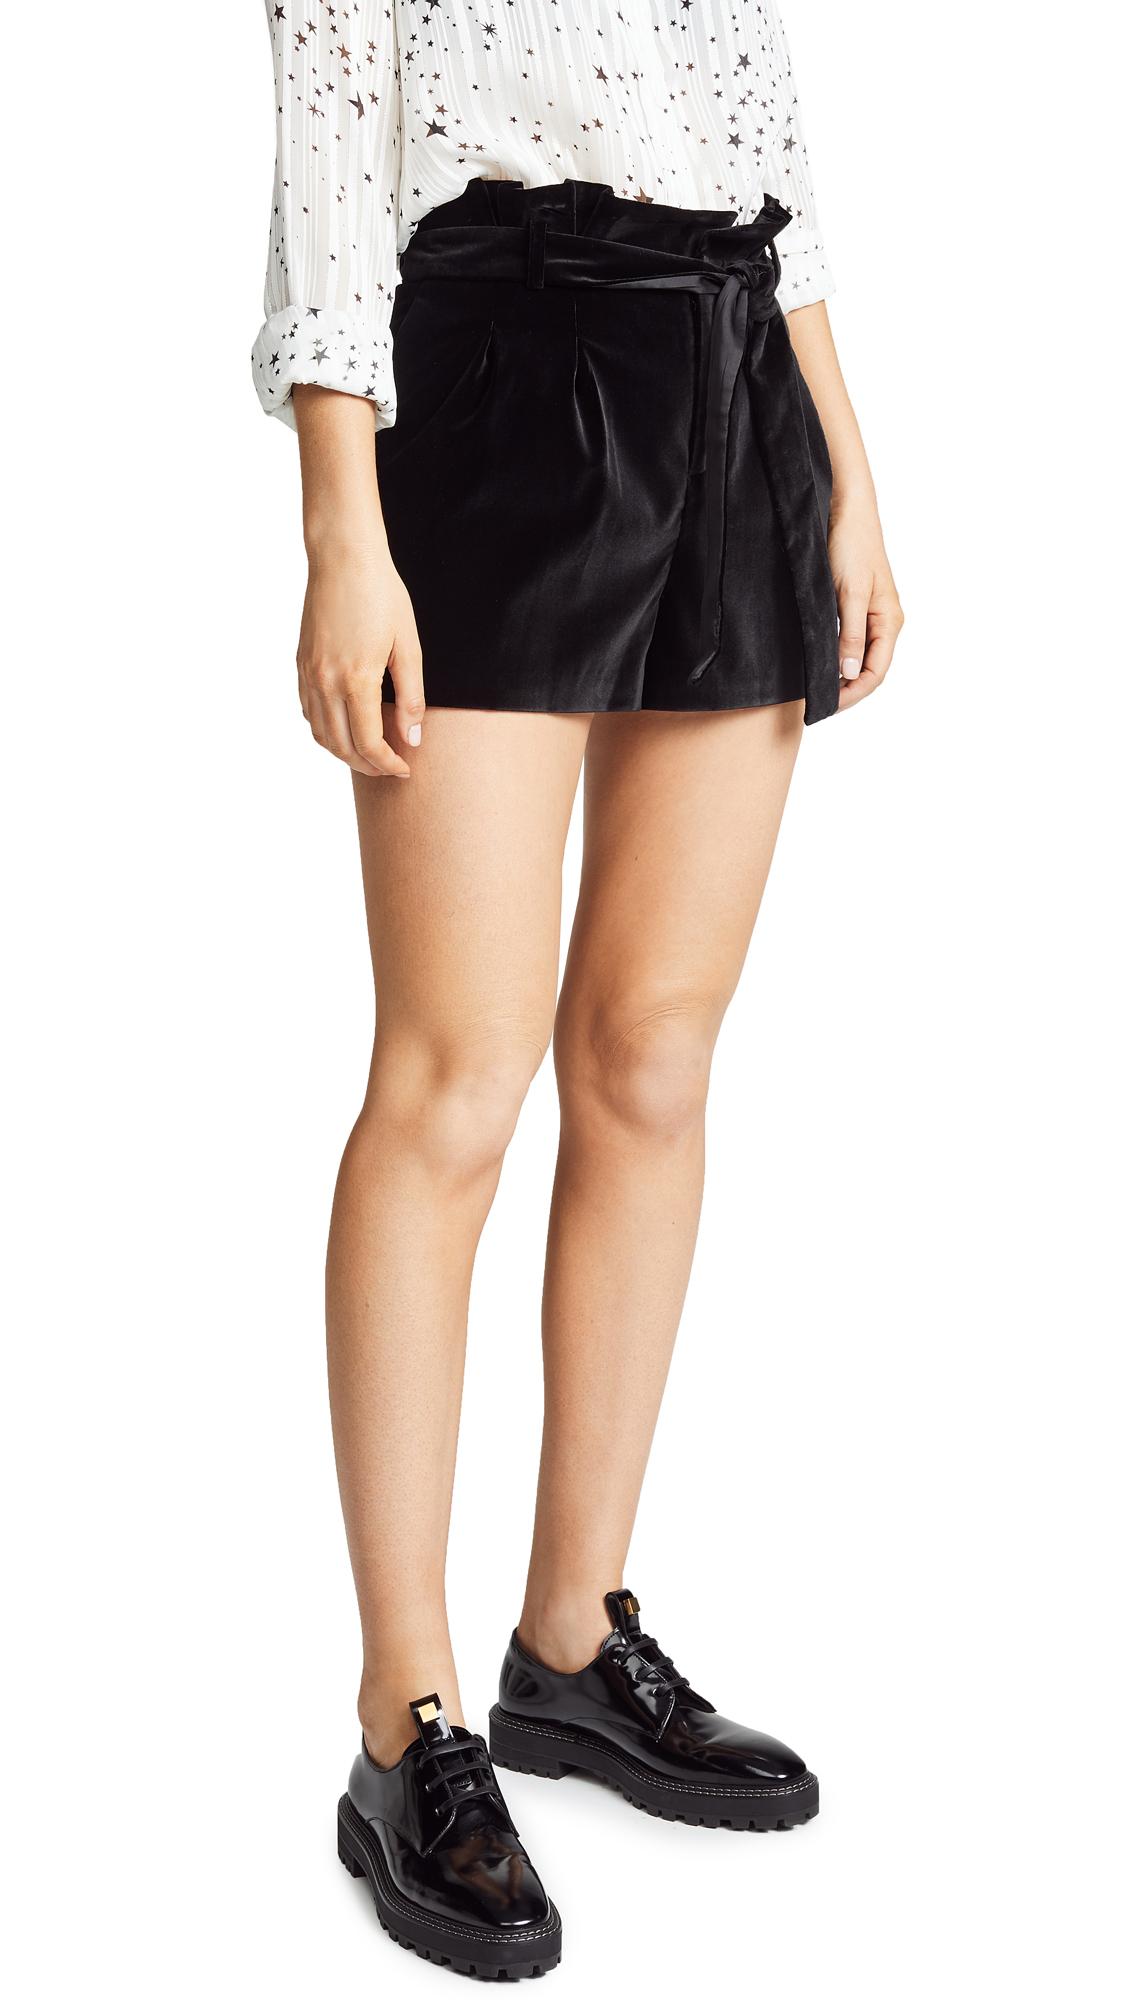 alice + olivia Laurine Paper Bag Shorts - Black